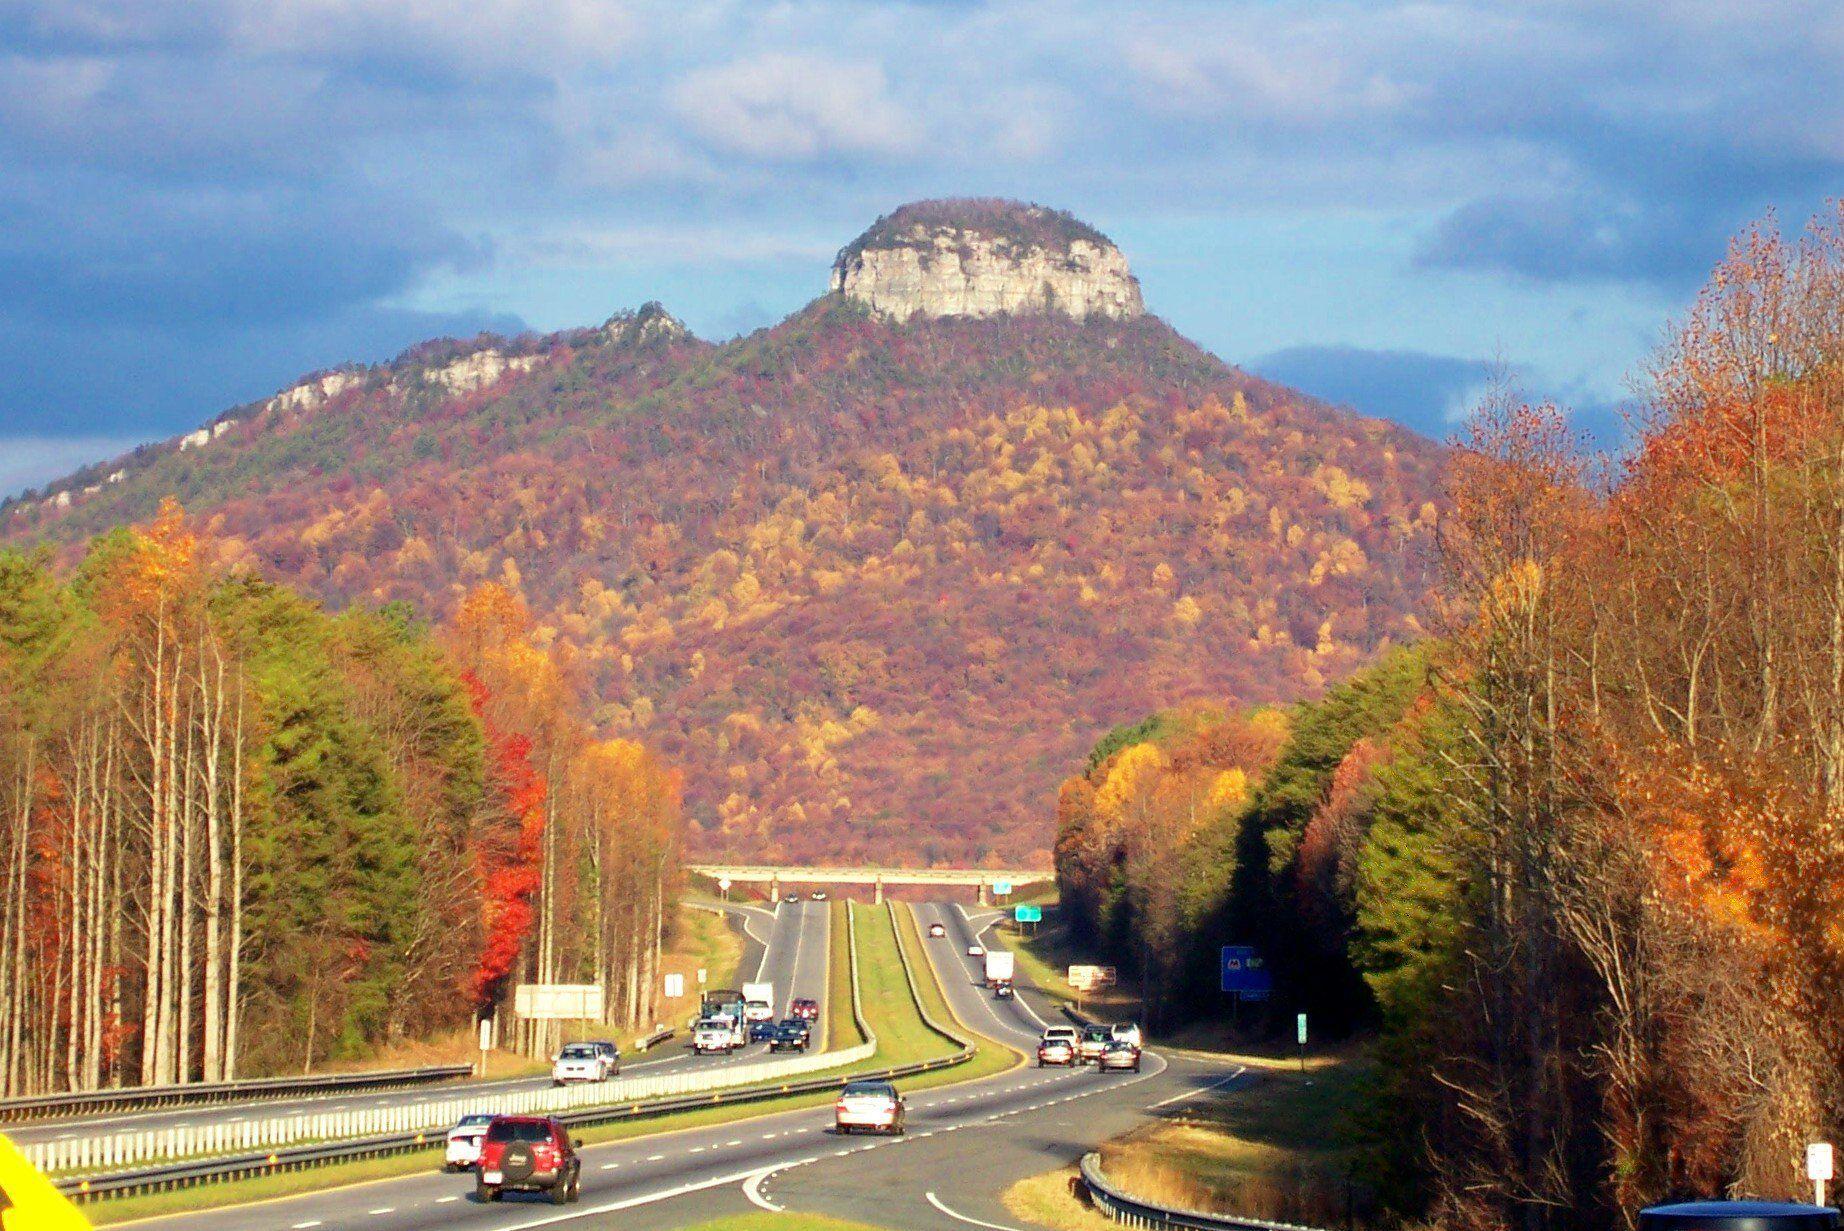 Pilot Near Me >> Pilot Mountain North Carolina! | Places I have visited | Pinterest